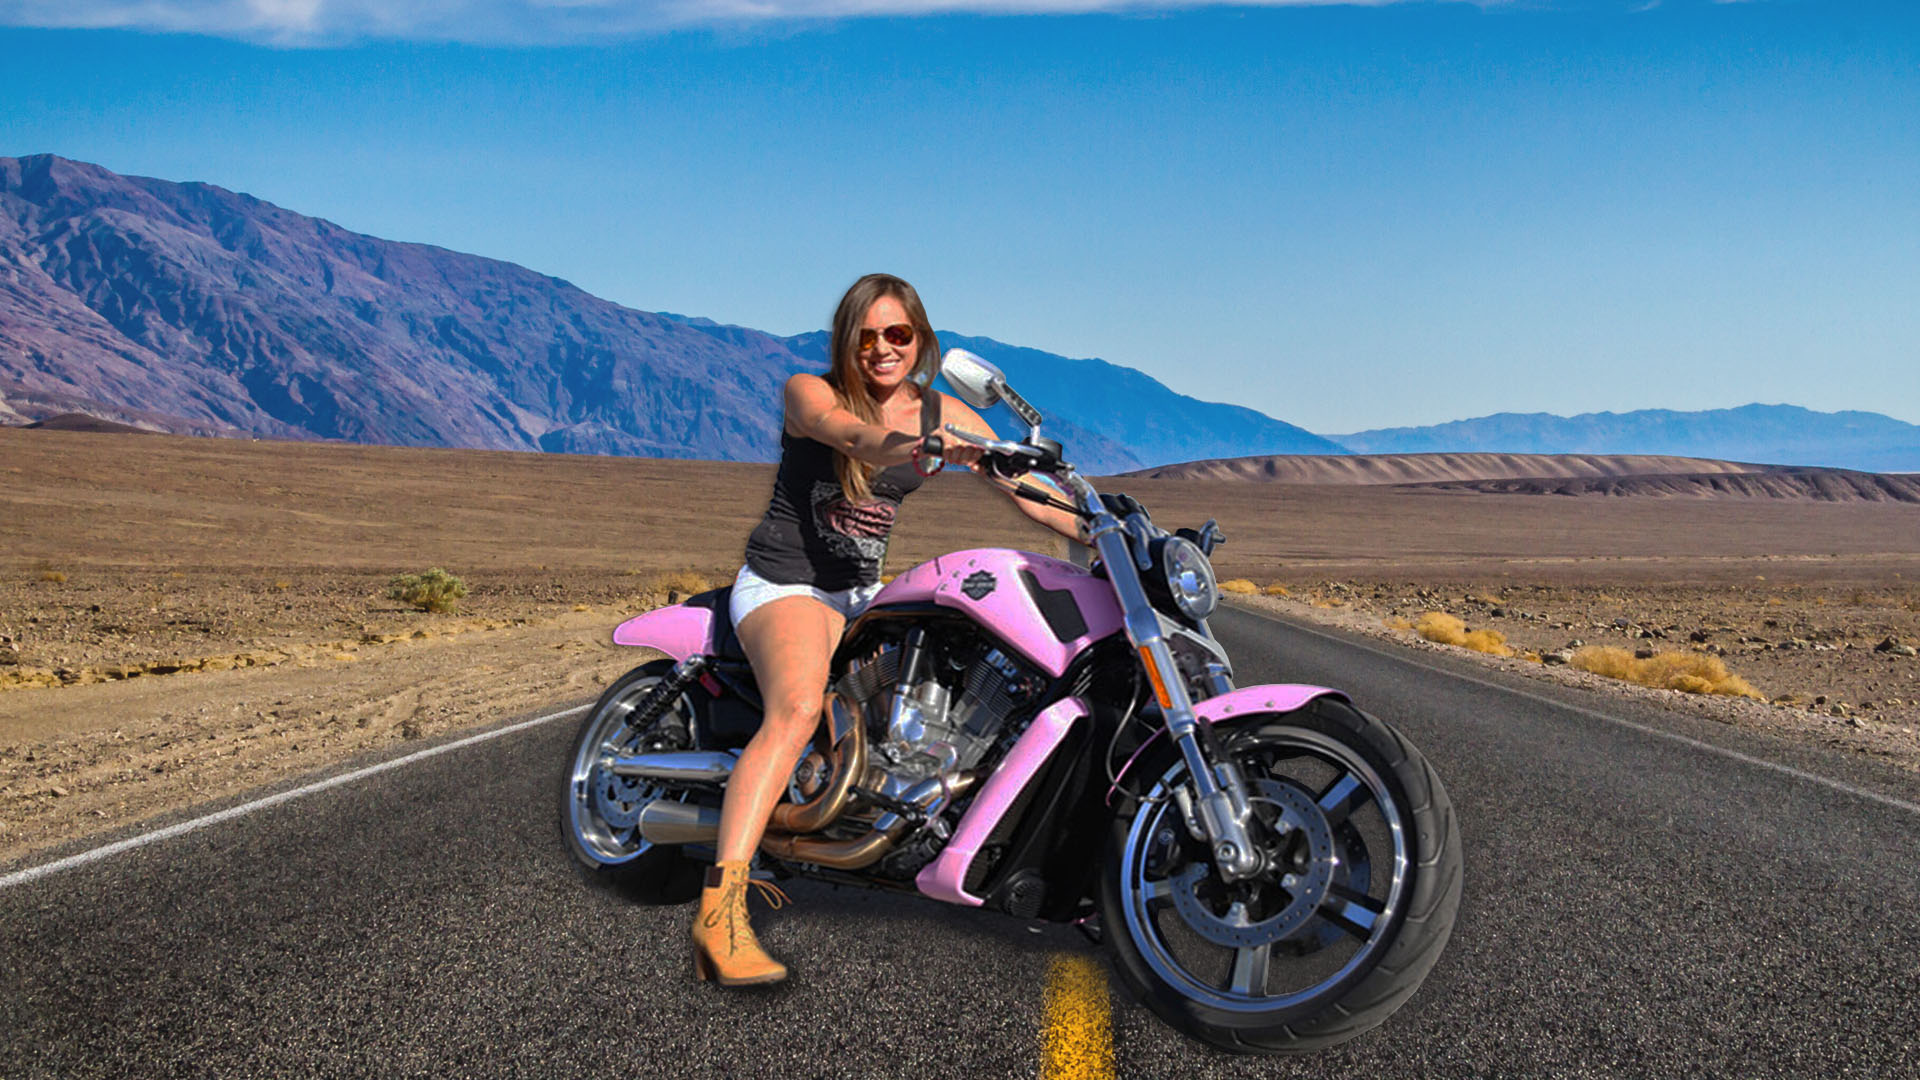 motorcycle-wraps